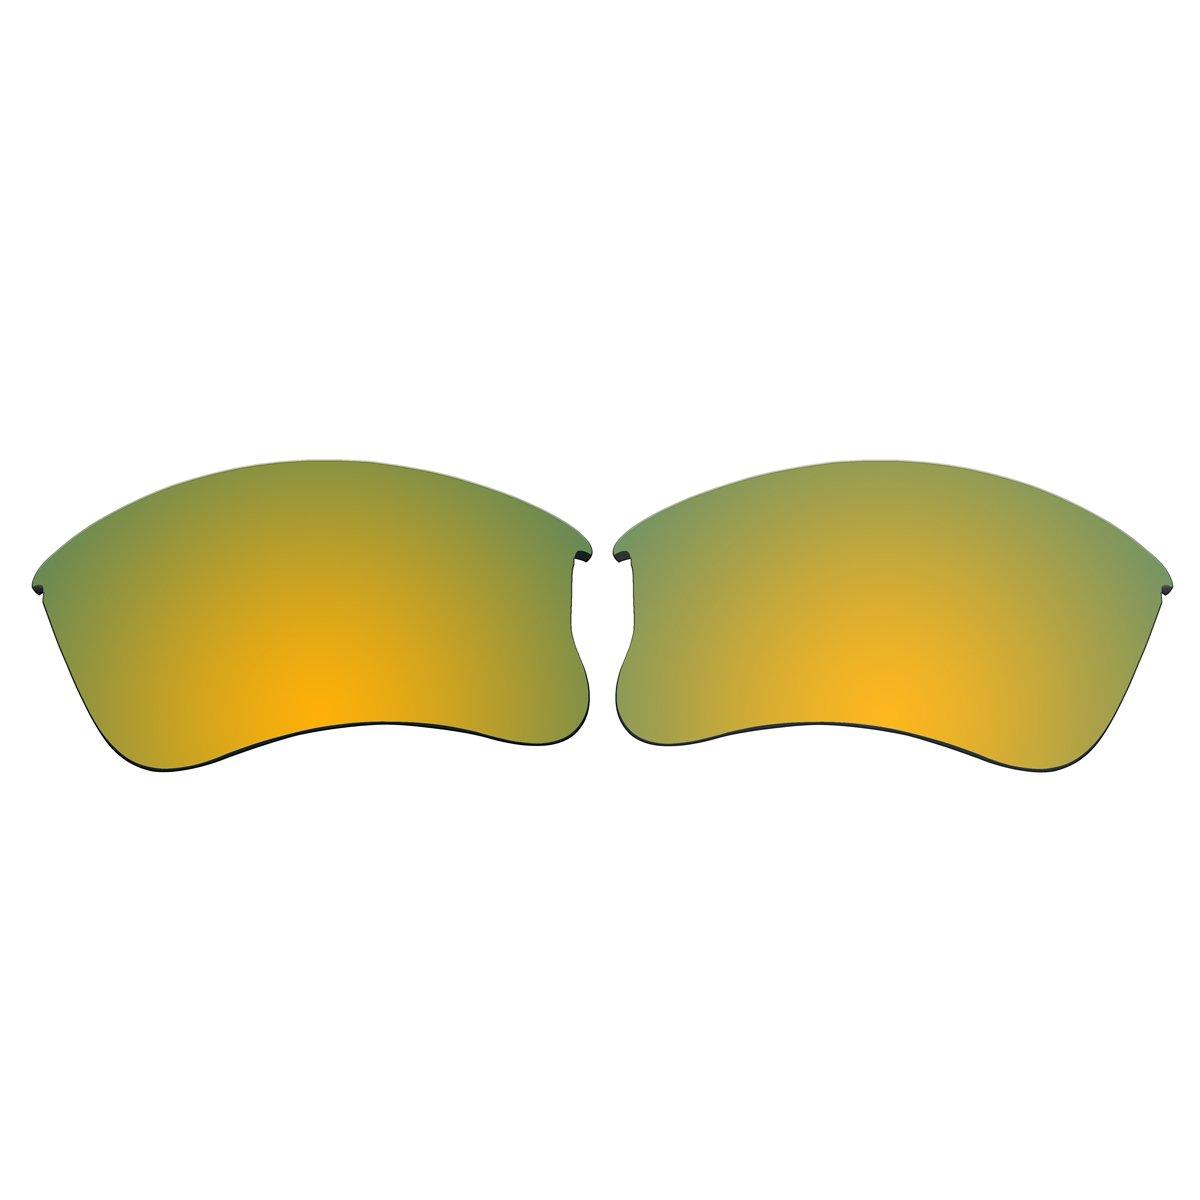 aCompatible Replacement Polarized Lenses for Oakley Flak Jacket XLJ (Gold Mirror)